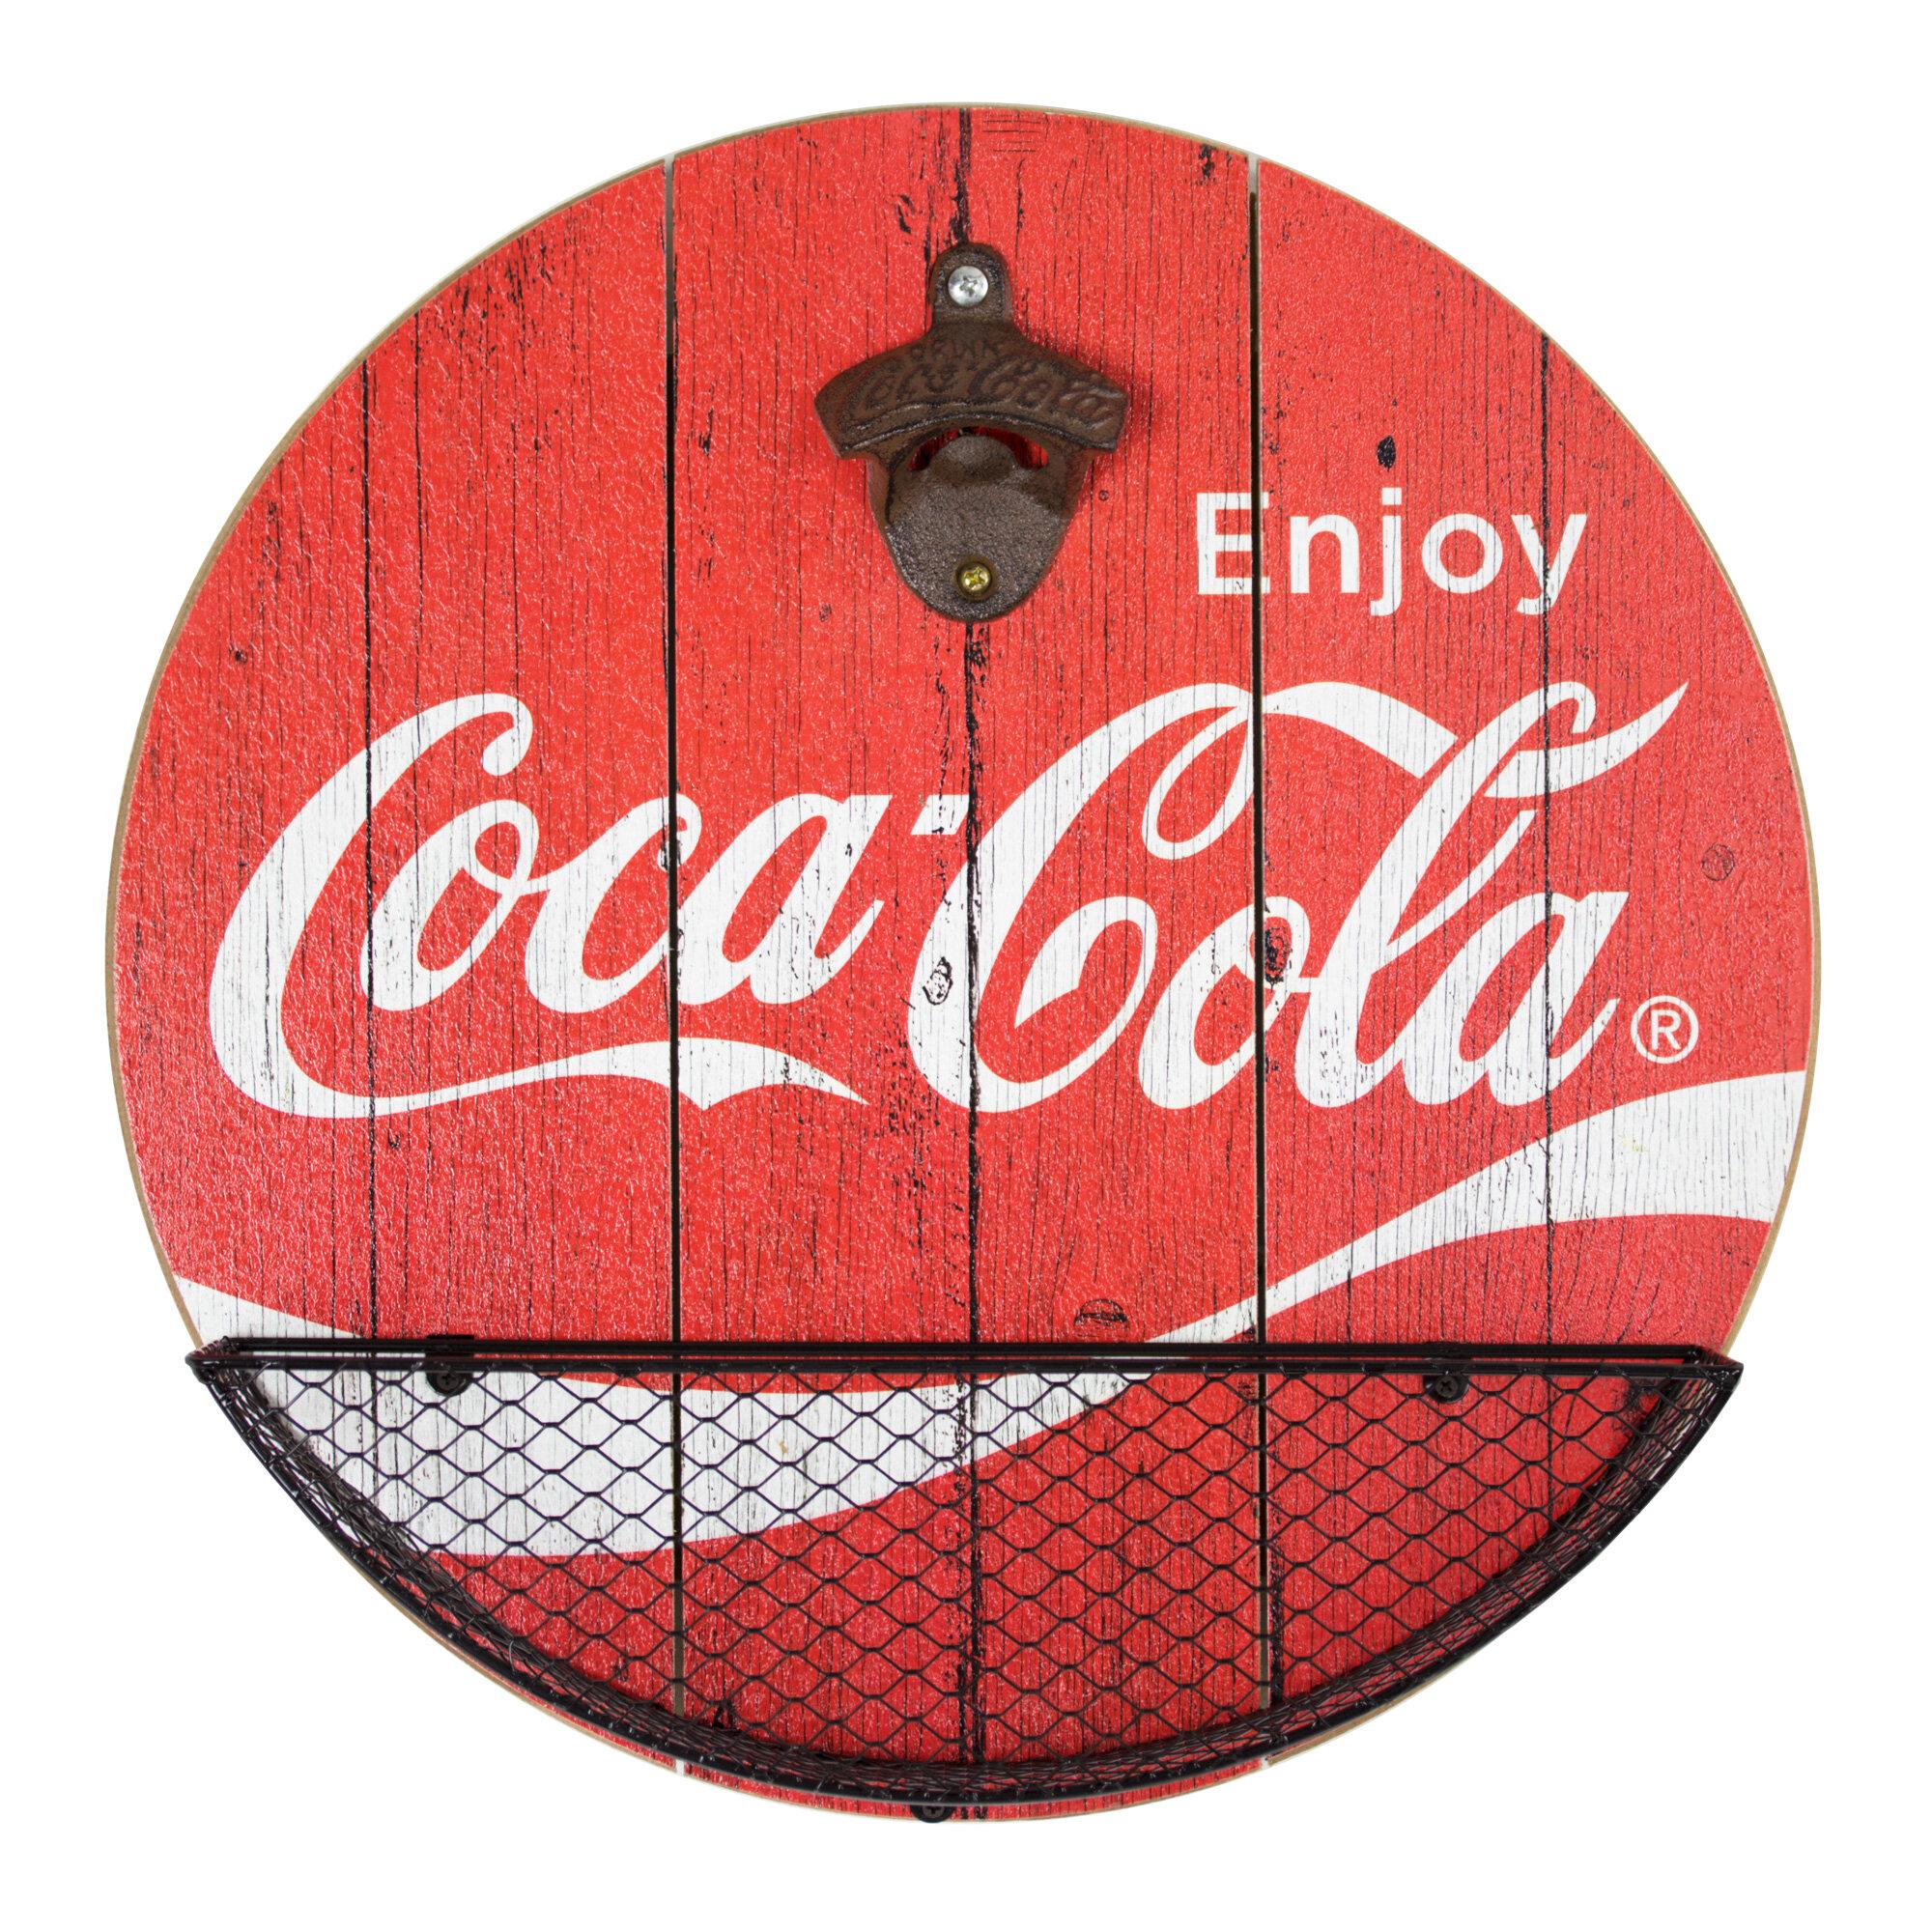 New Coca Cola Red metal wall mounted bottle opener beer opener bar opener tool